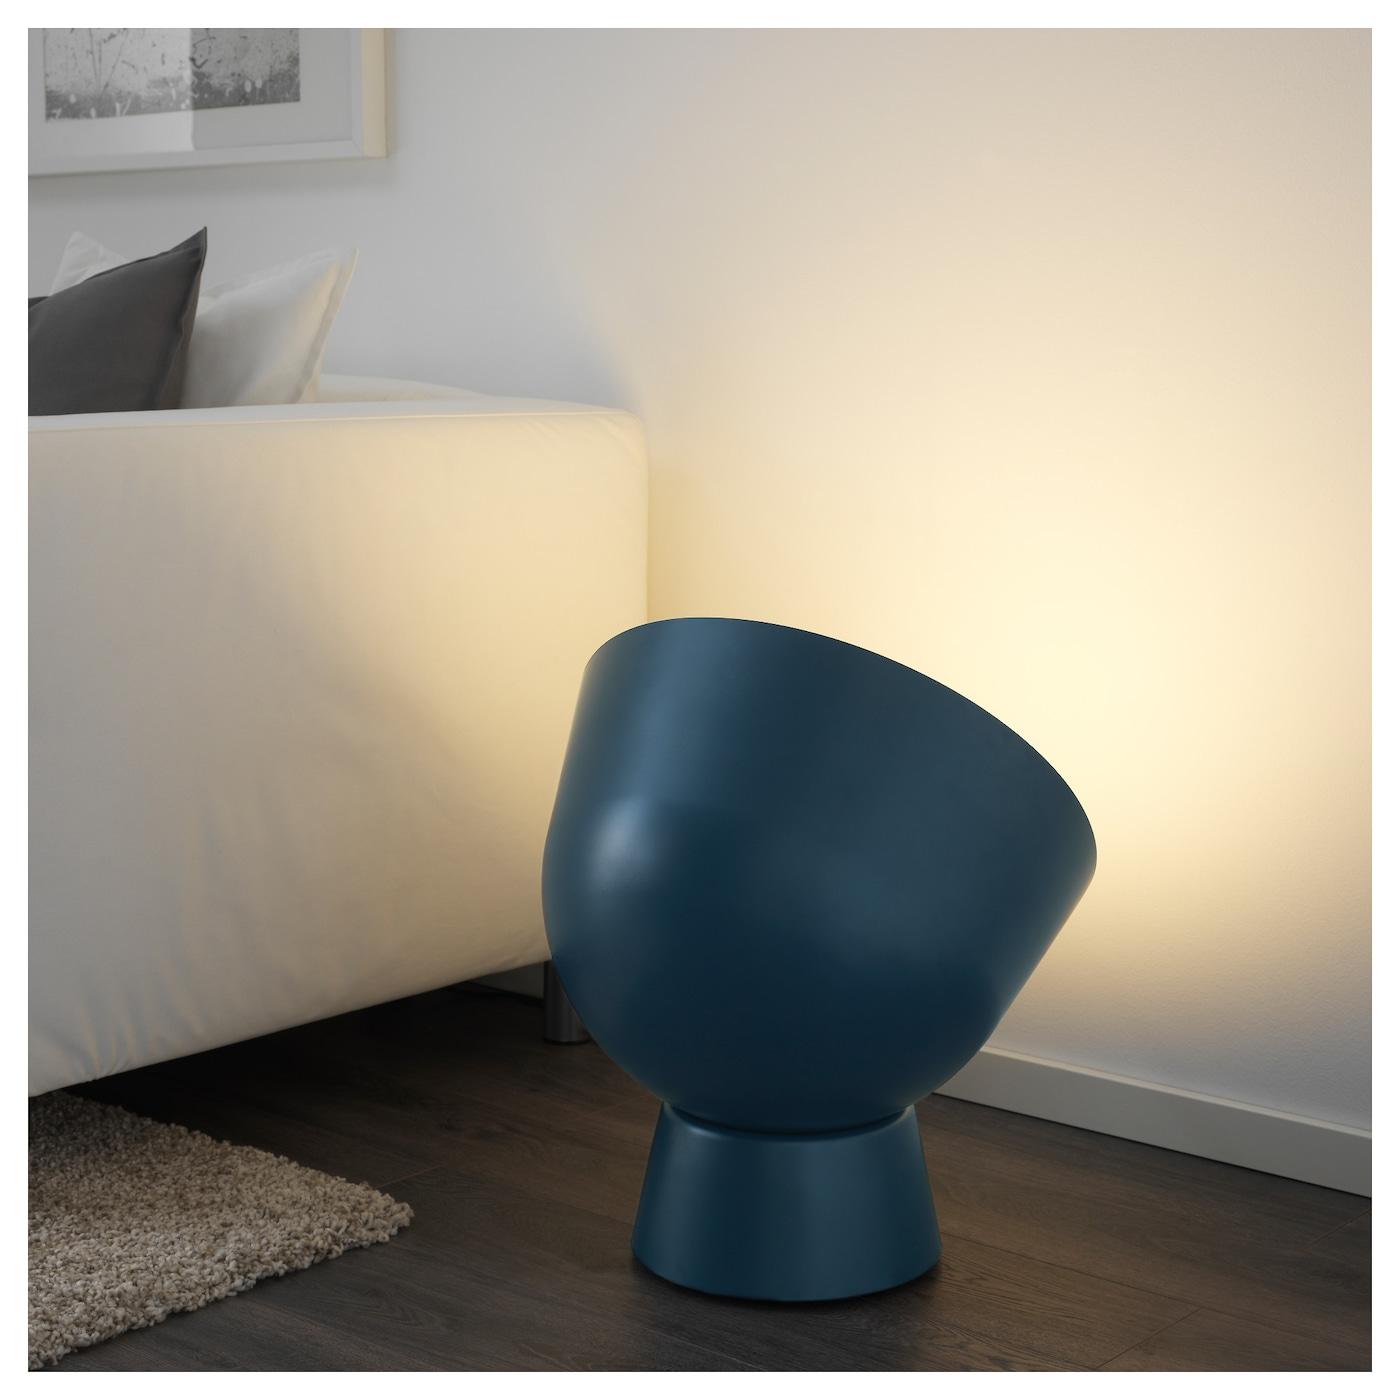 ikea ps 2017 floor lamp dark blue ikea. Black Bedroom Furniture Sets. Home Design Ideas